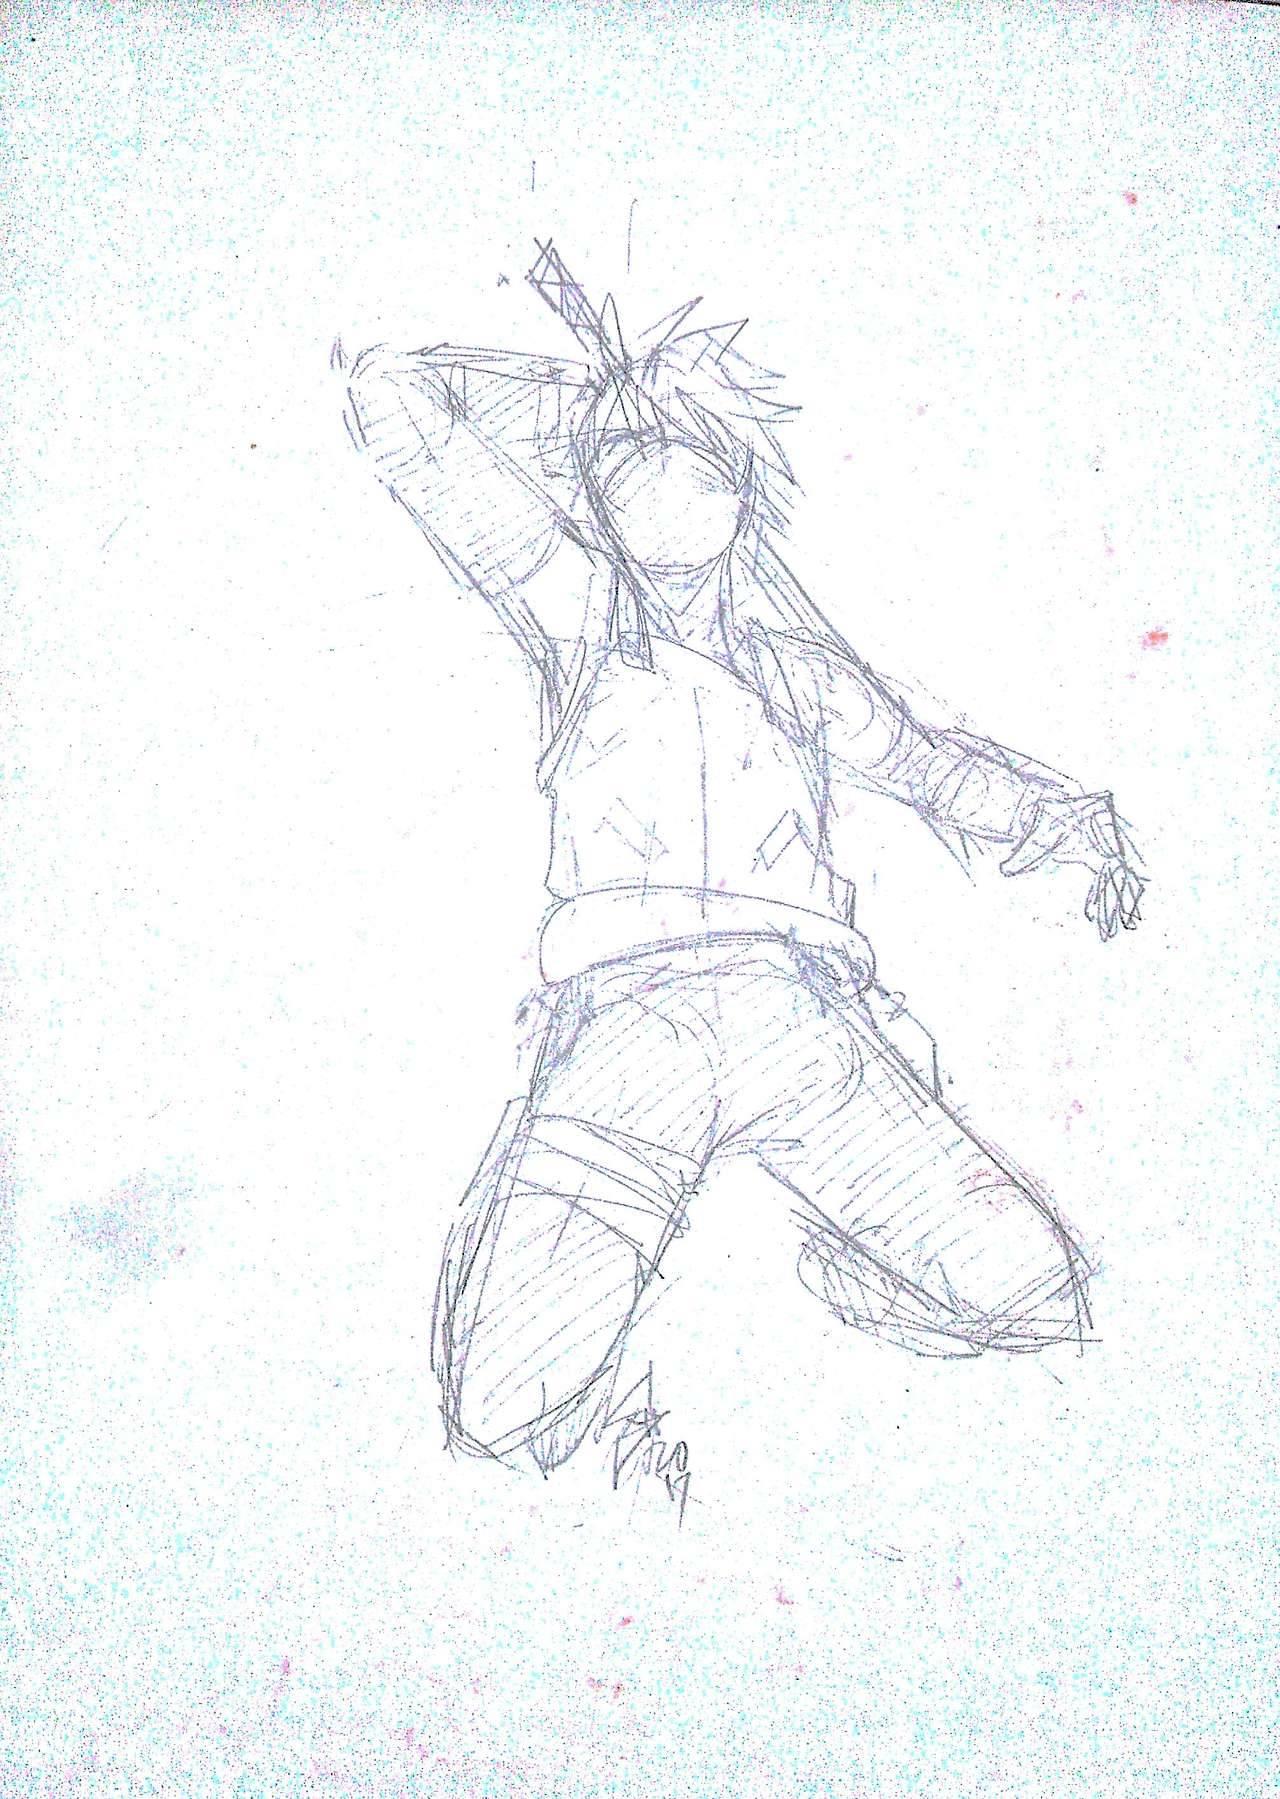 Full Body Kakashi Drawing : kakashi, drawing, Kakashifest, Explore, Tumblr, Posts, Blogs, Tumgir